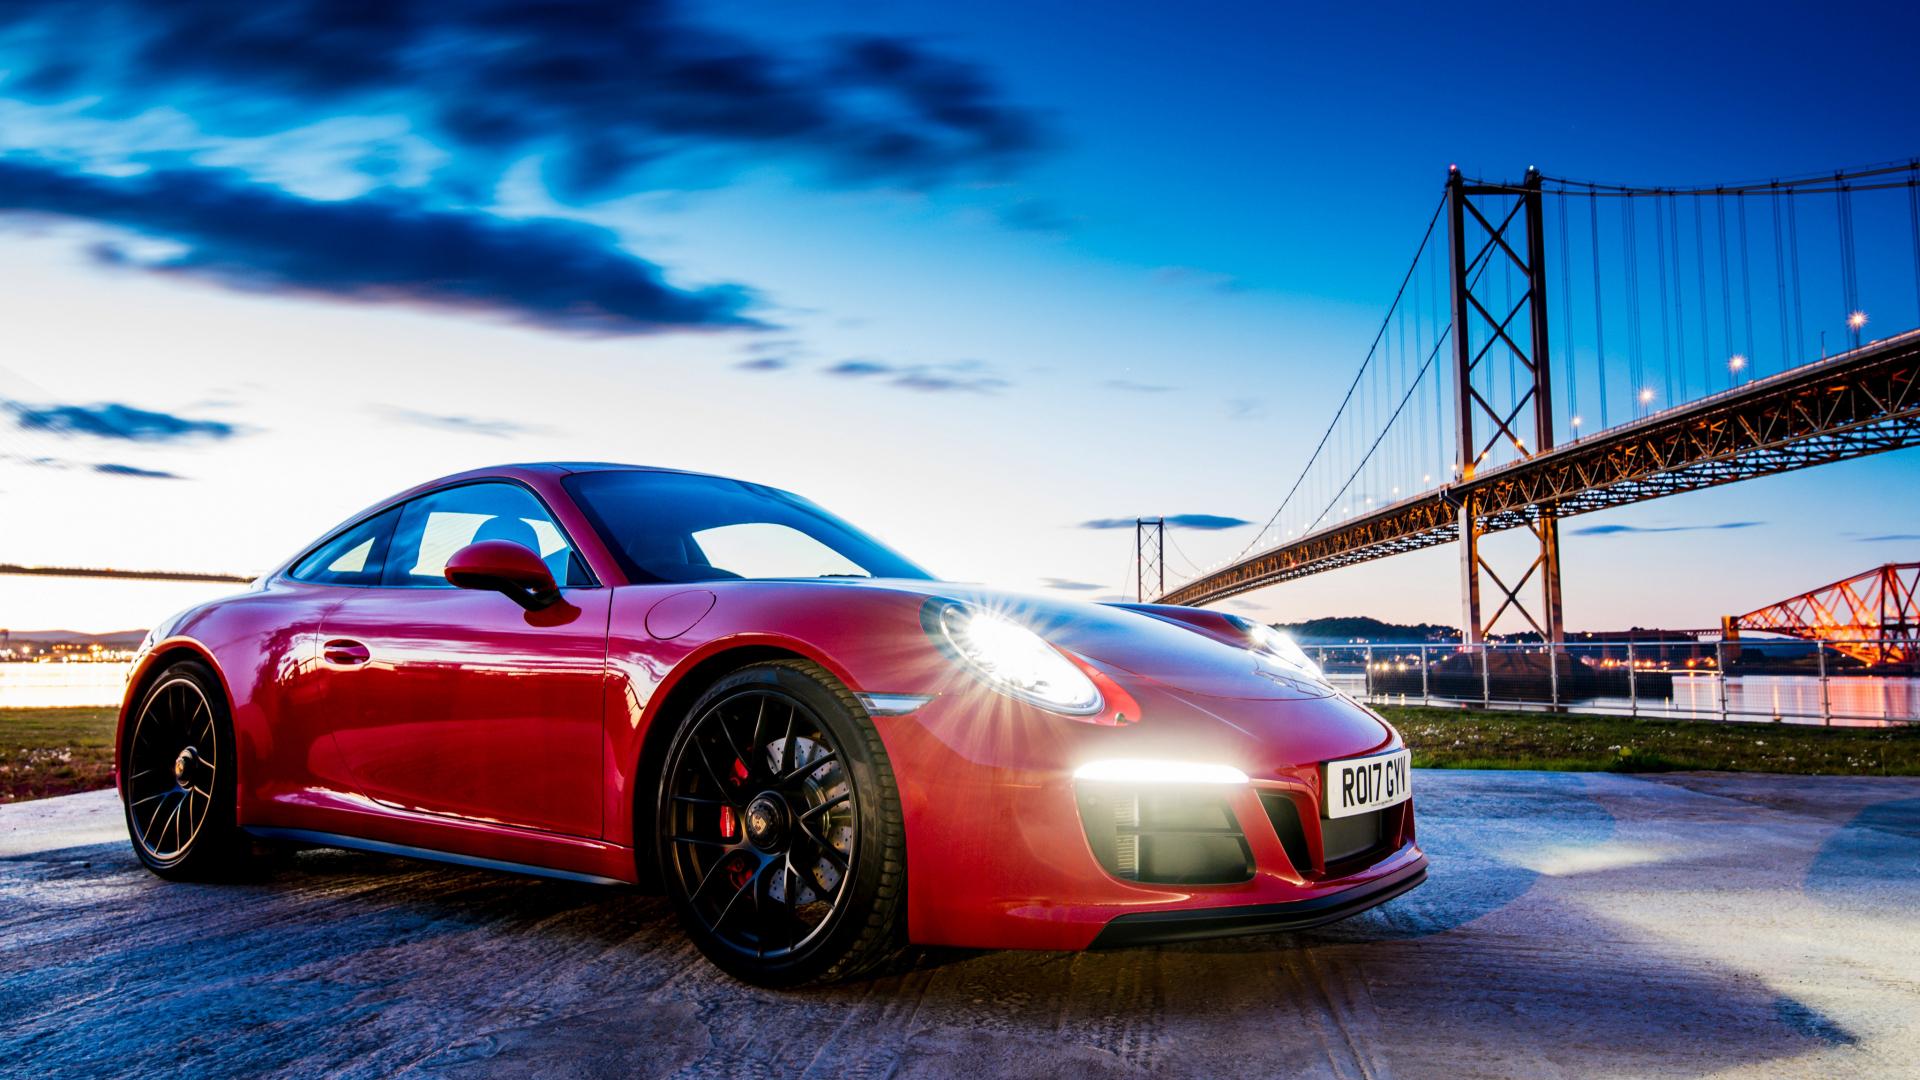 2017 porsche 911 carrera gts, coupe